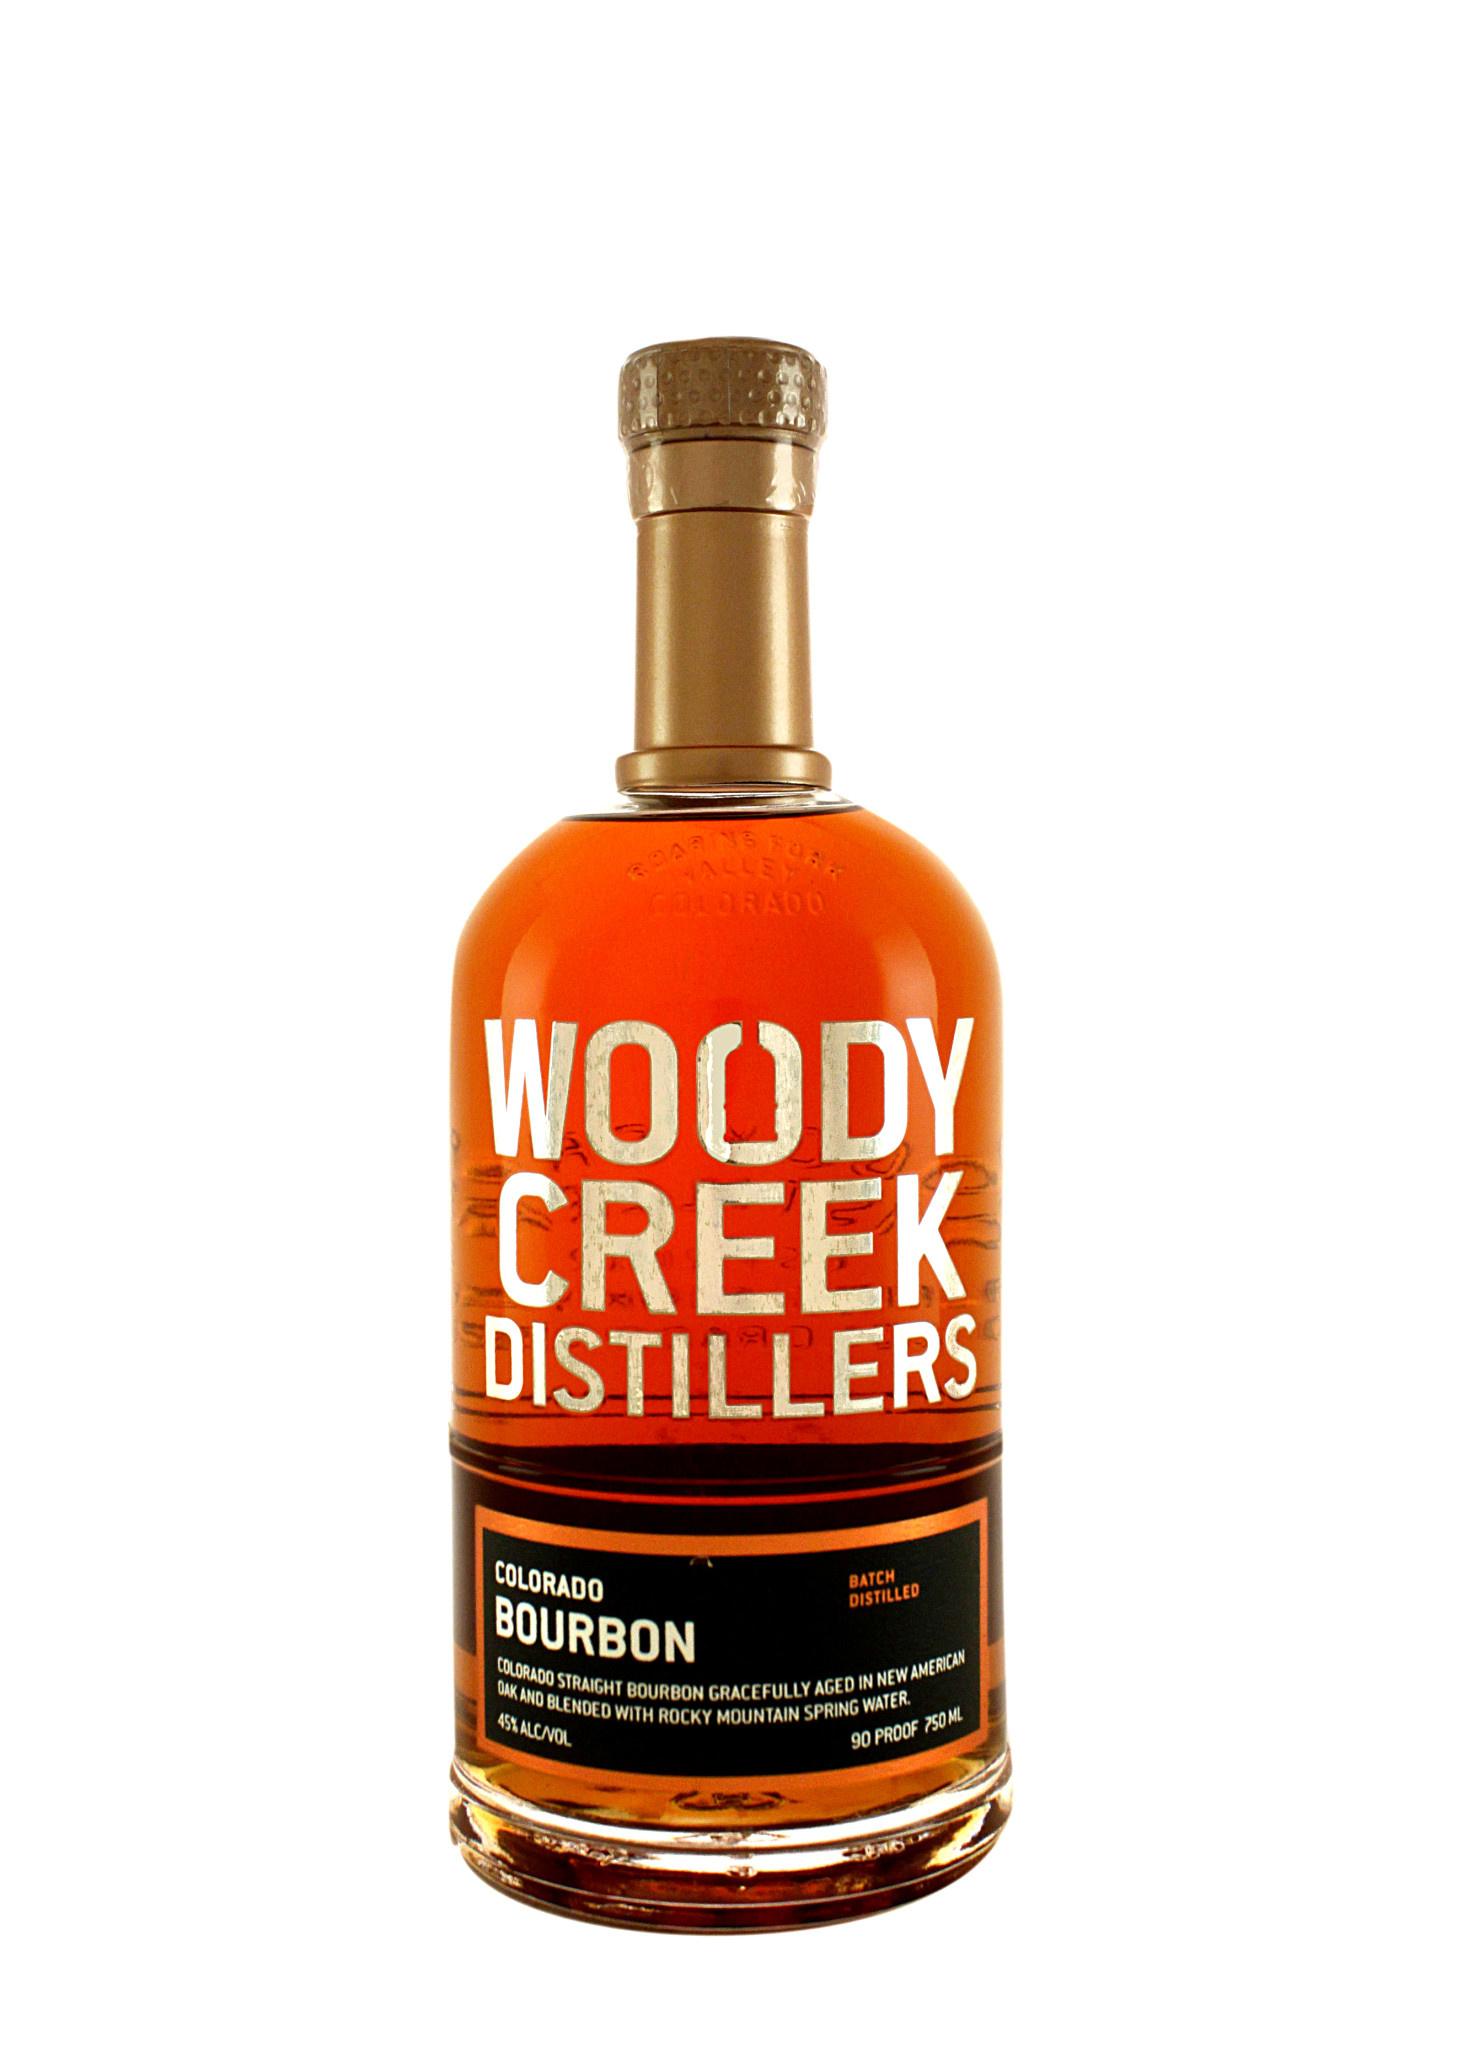 Woody Creek Straight Bourbon Whiskey, Basalt, Colorado